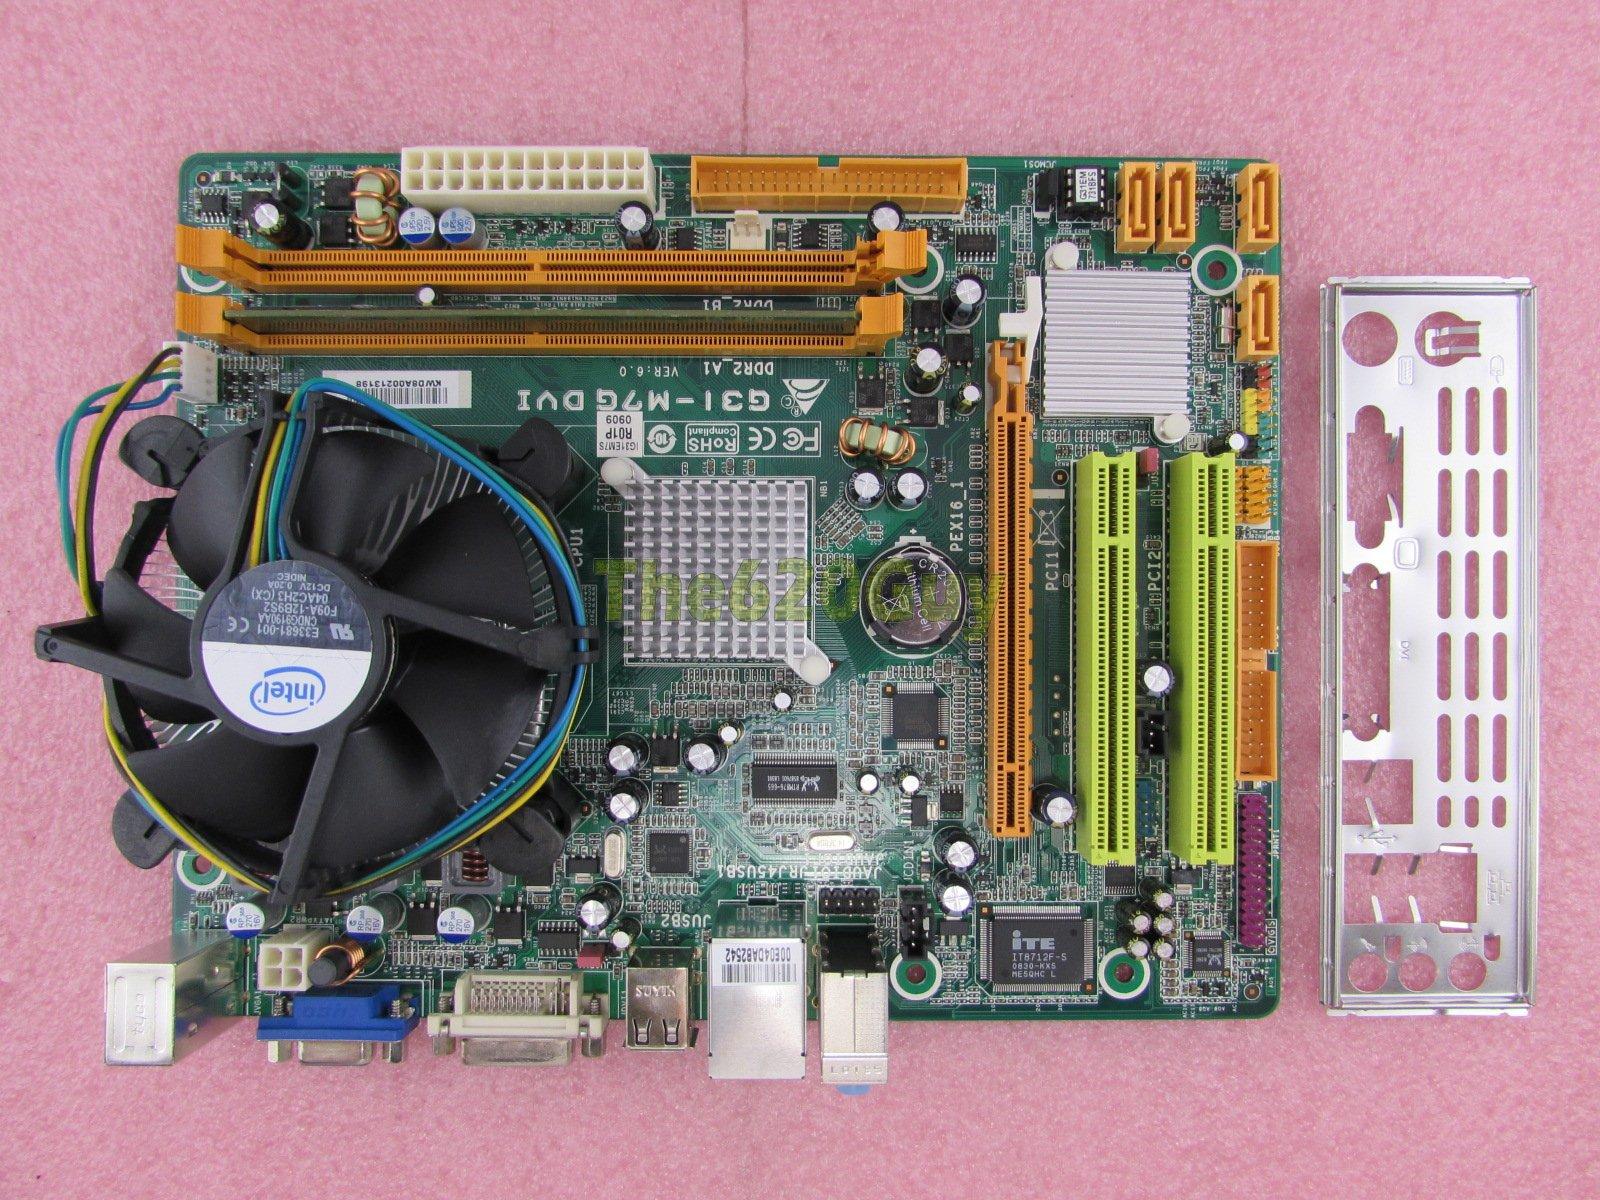 Driver Needed Intel G (ICH7 Family) I/O Controller Hub LAN